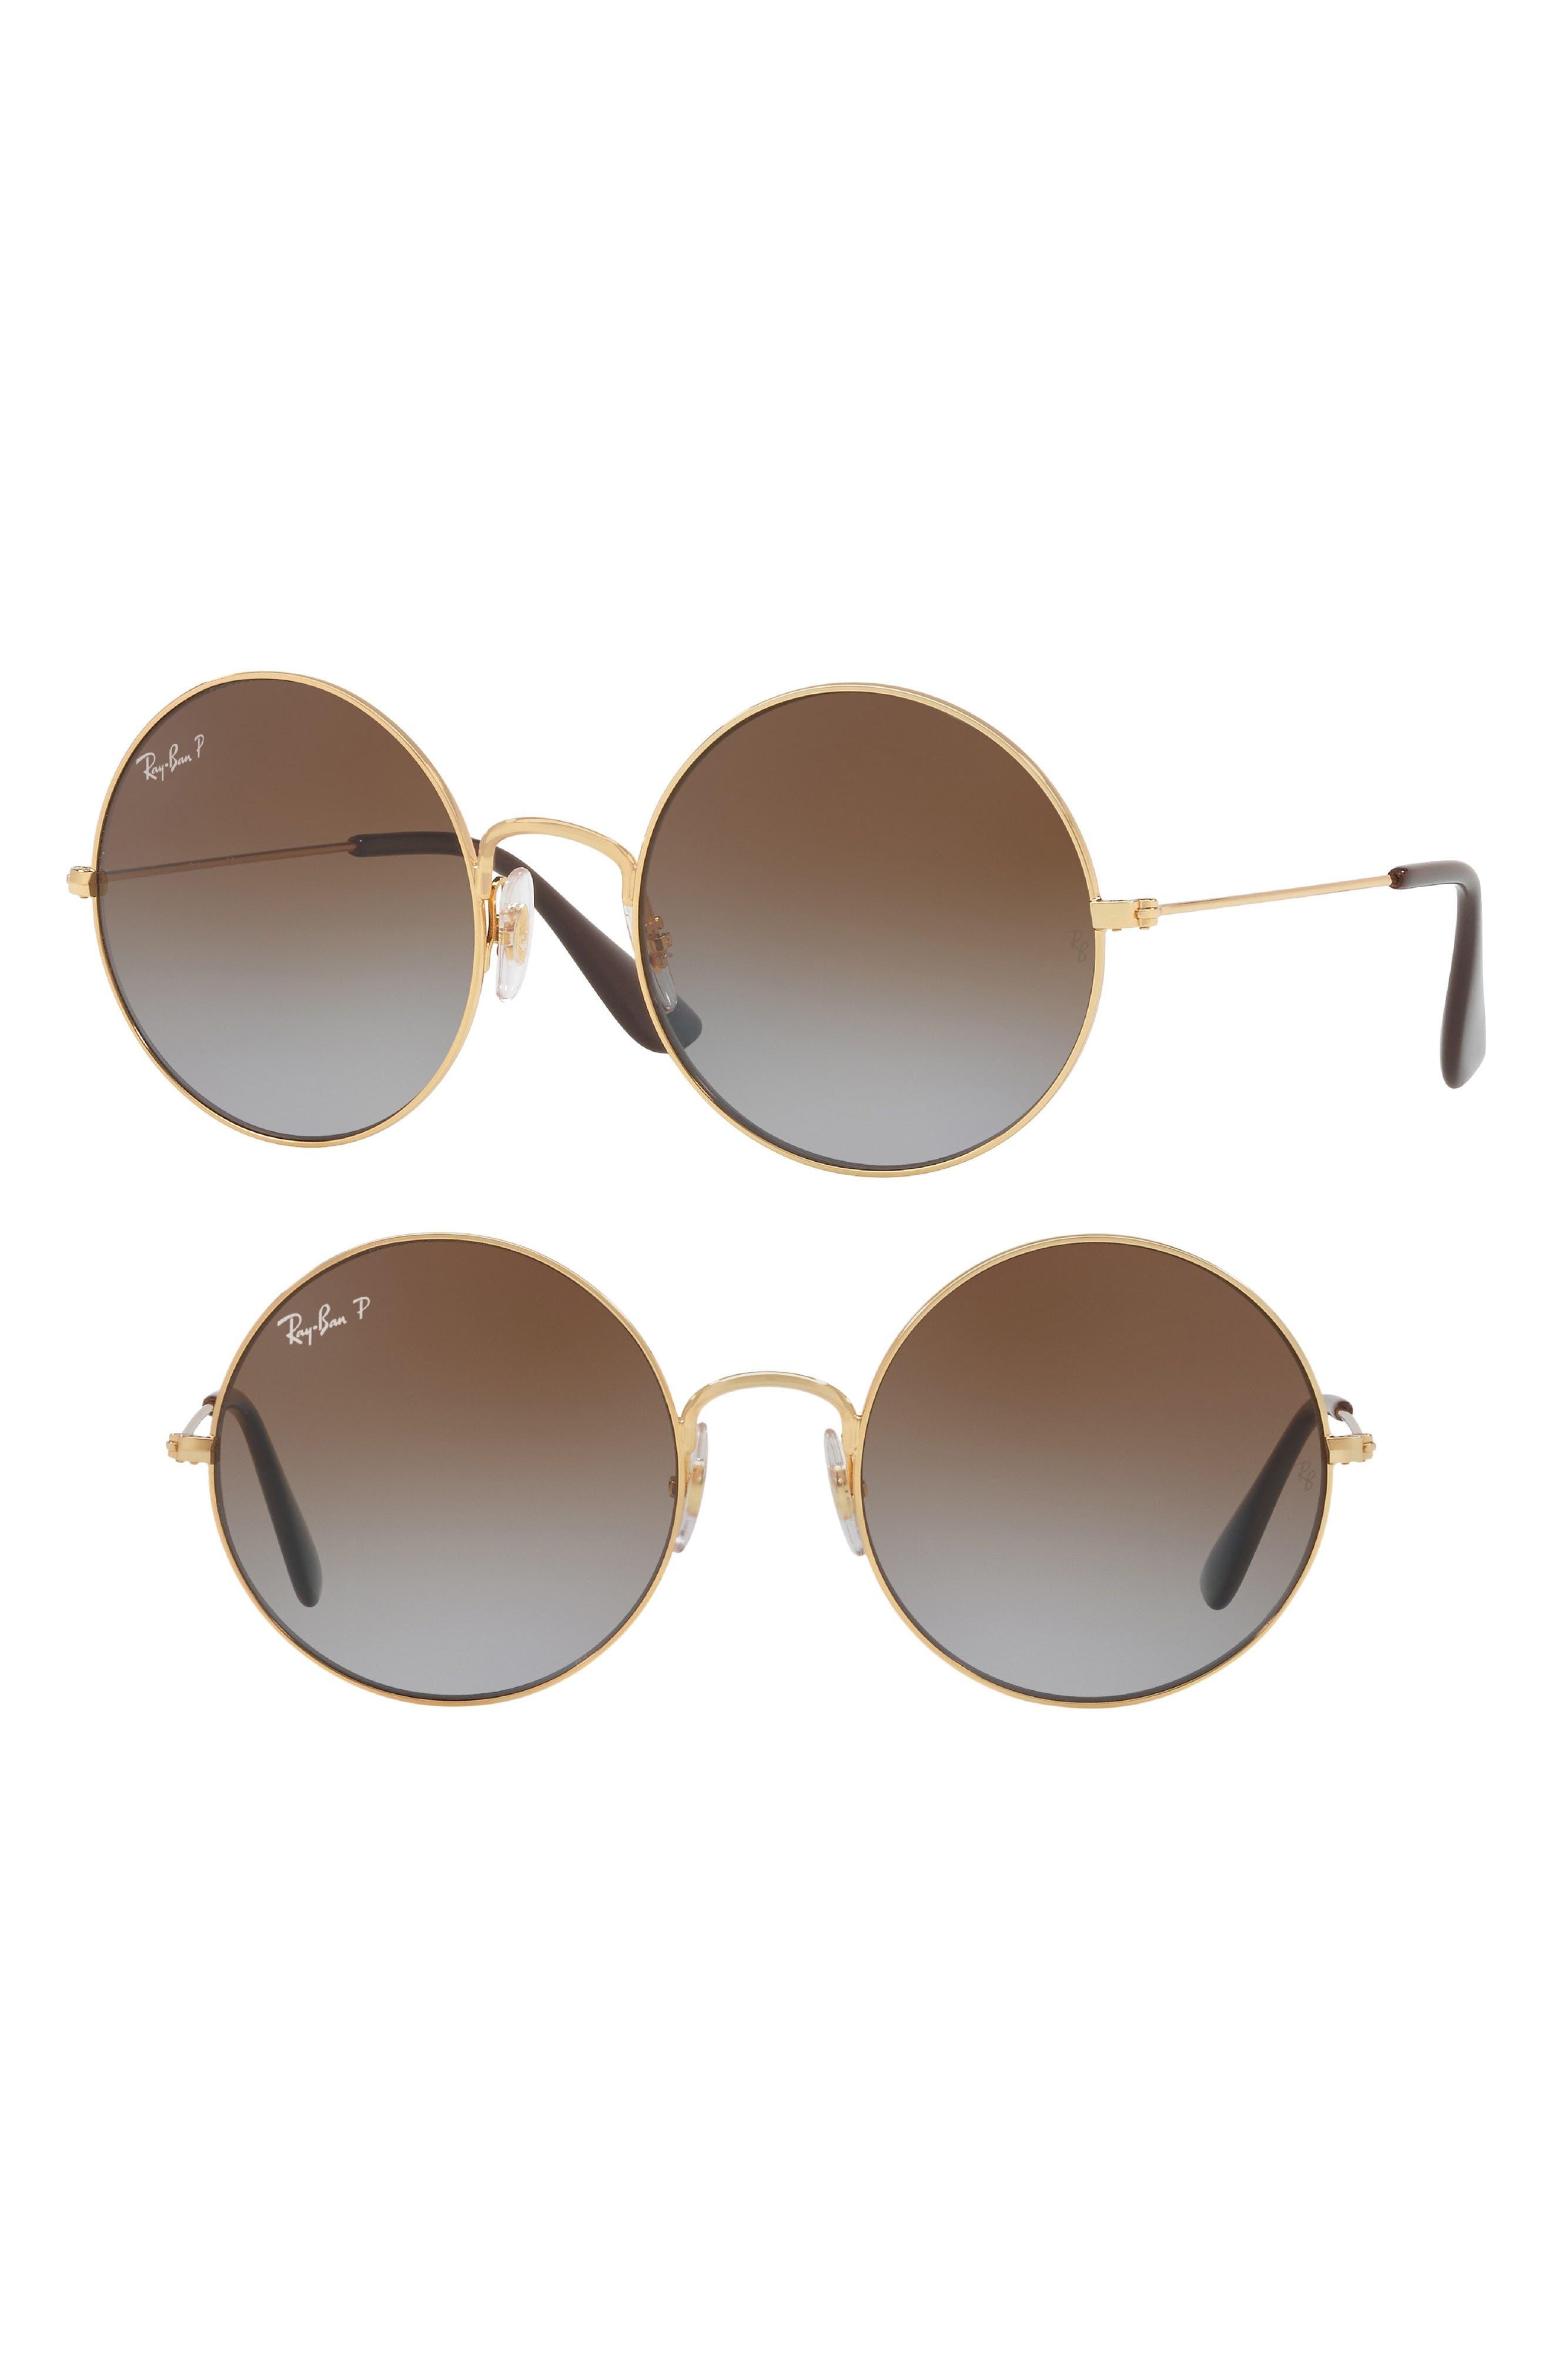 Ja-Jo 50mm Round Polarized Sunglasses,                         Main,                         color, Gold/ Brown